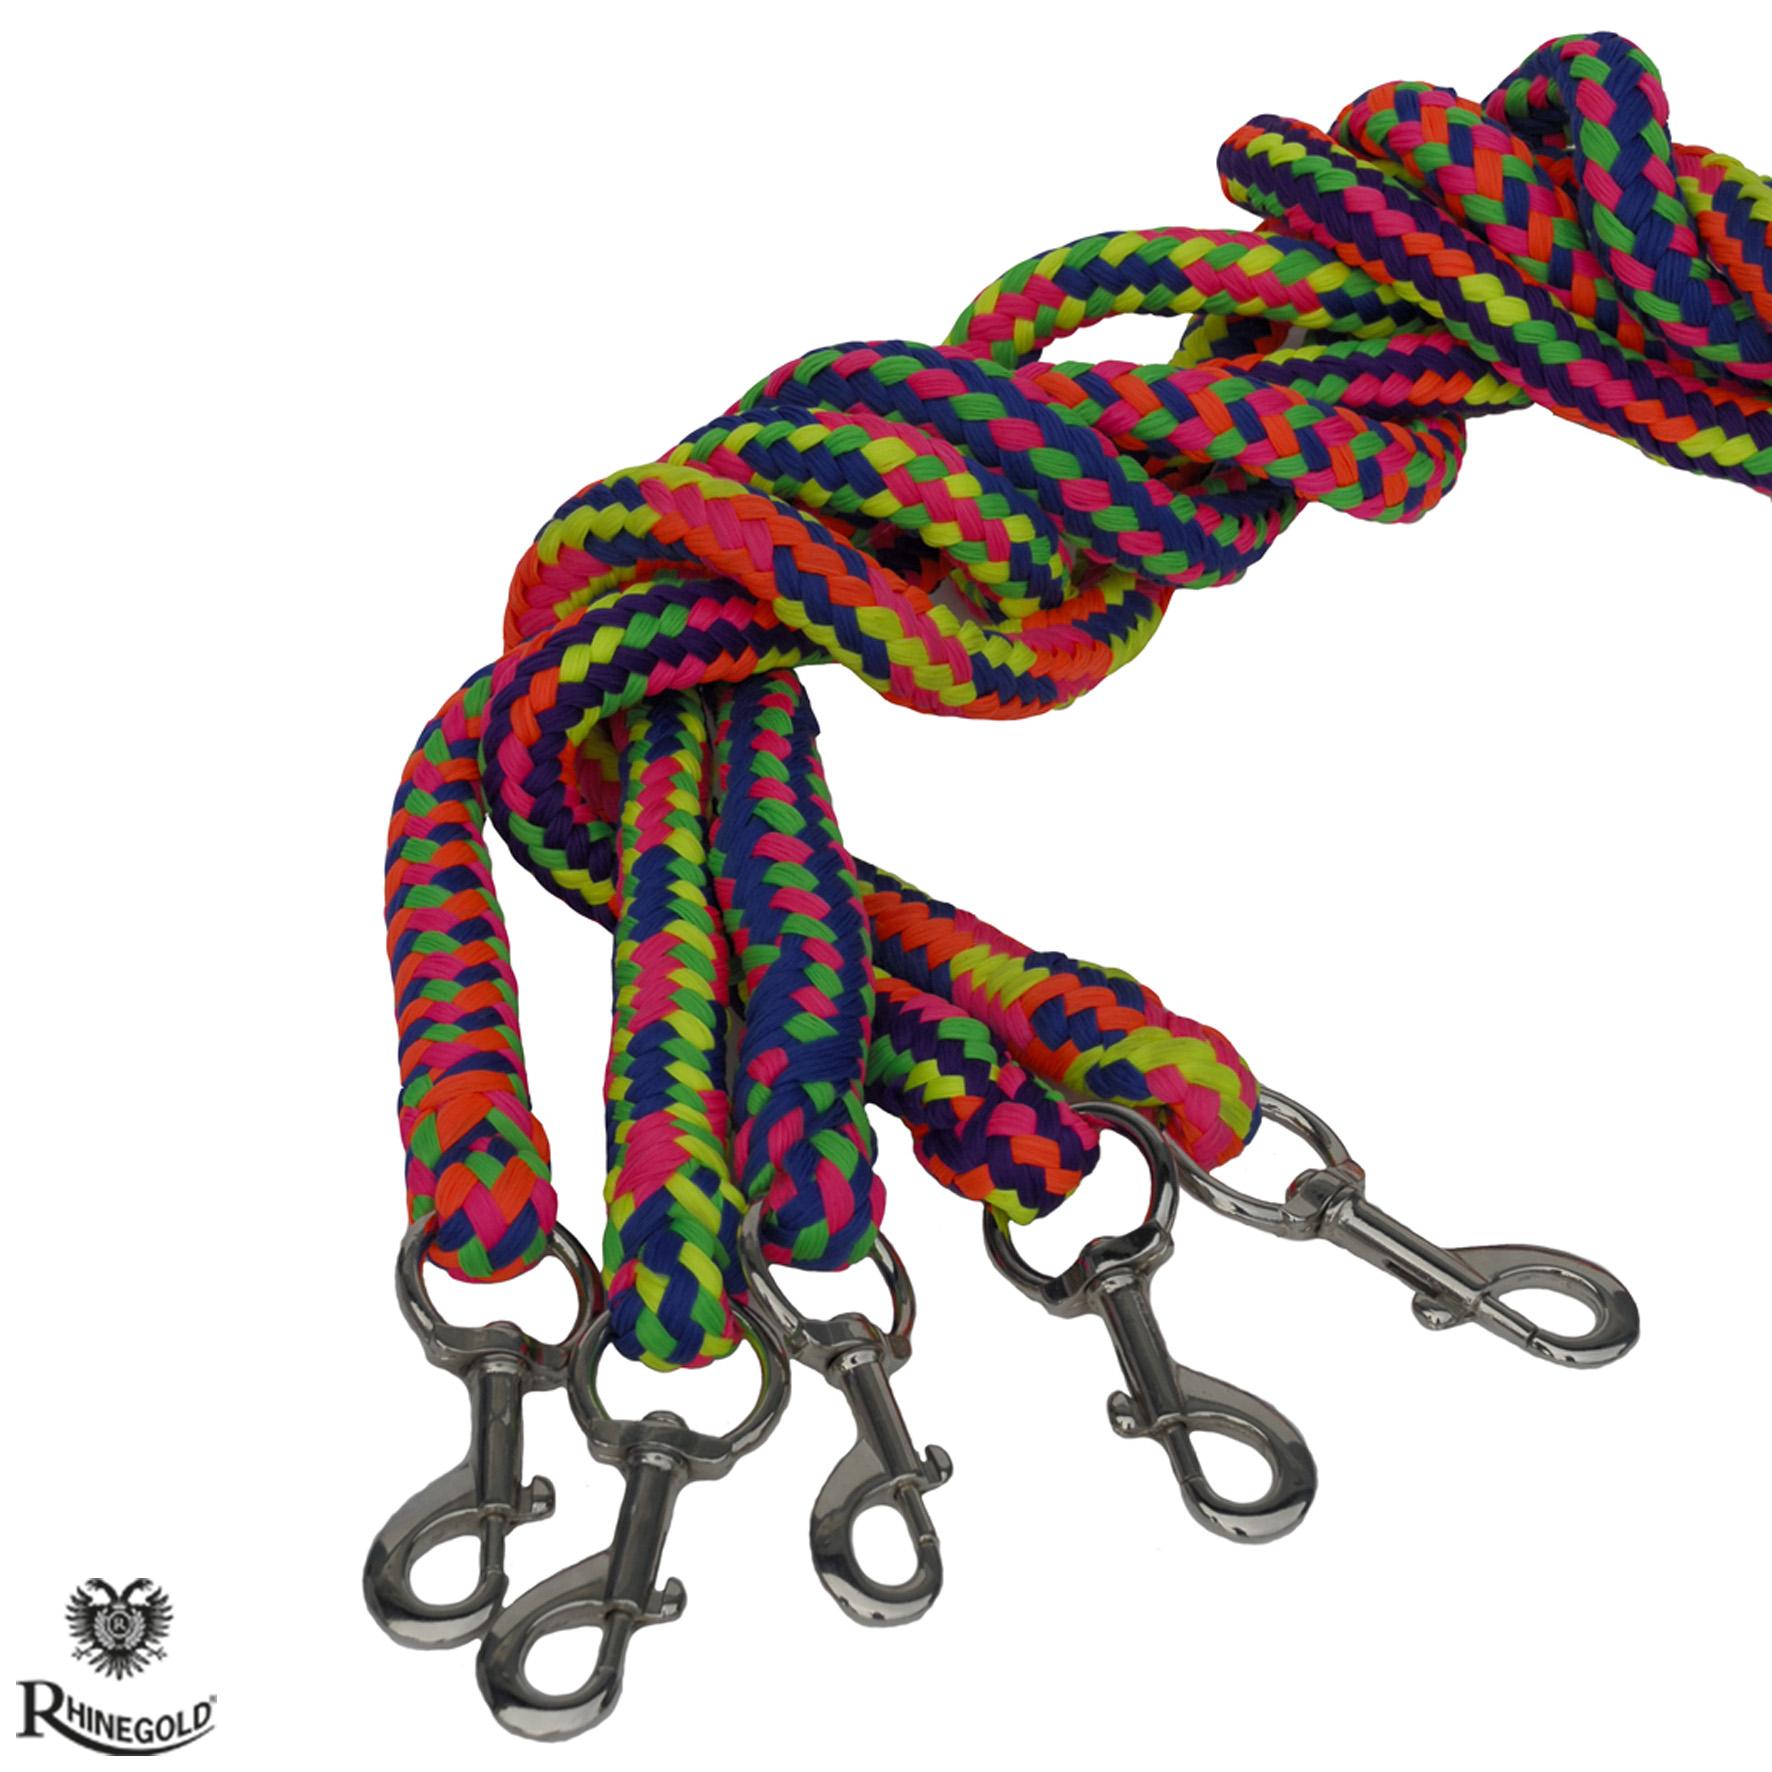 Rhinegold Neon Lead Rope